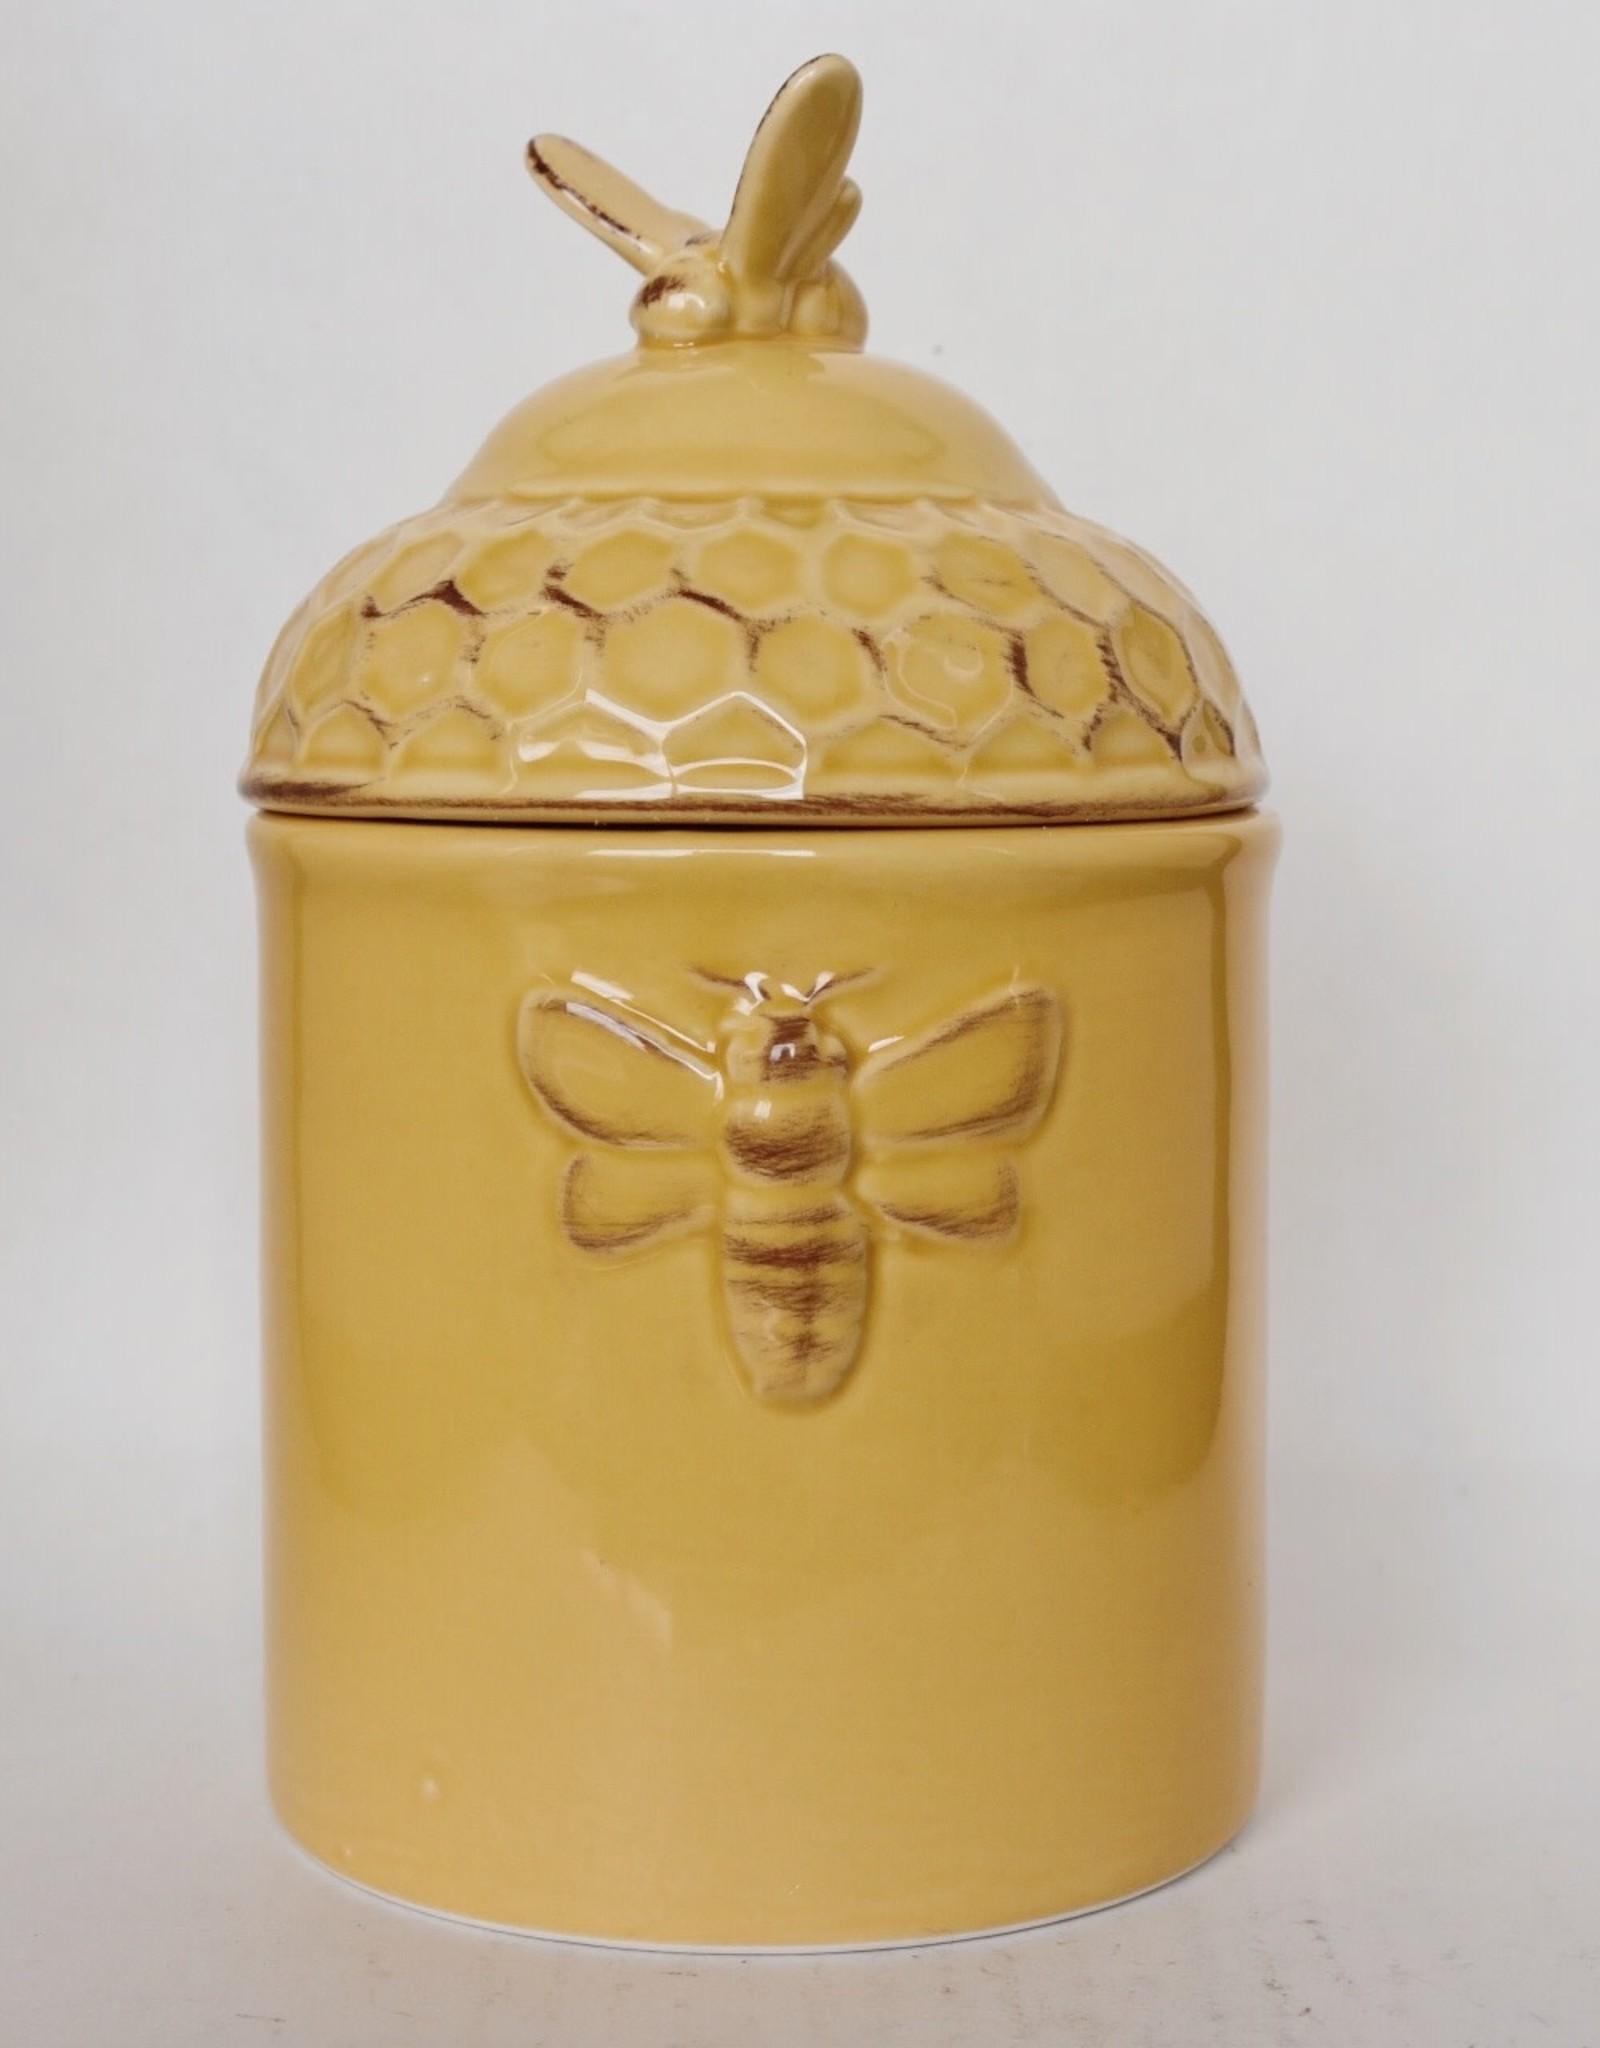 Honeycomb Goody Jar